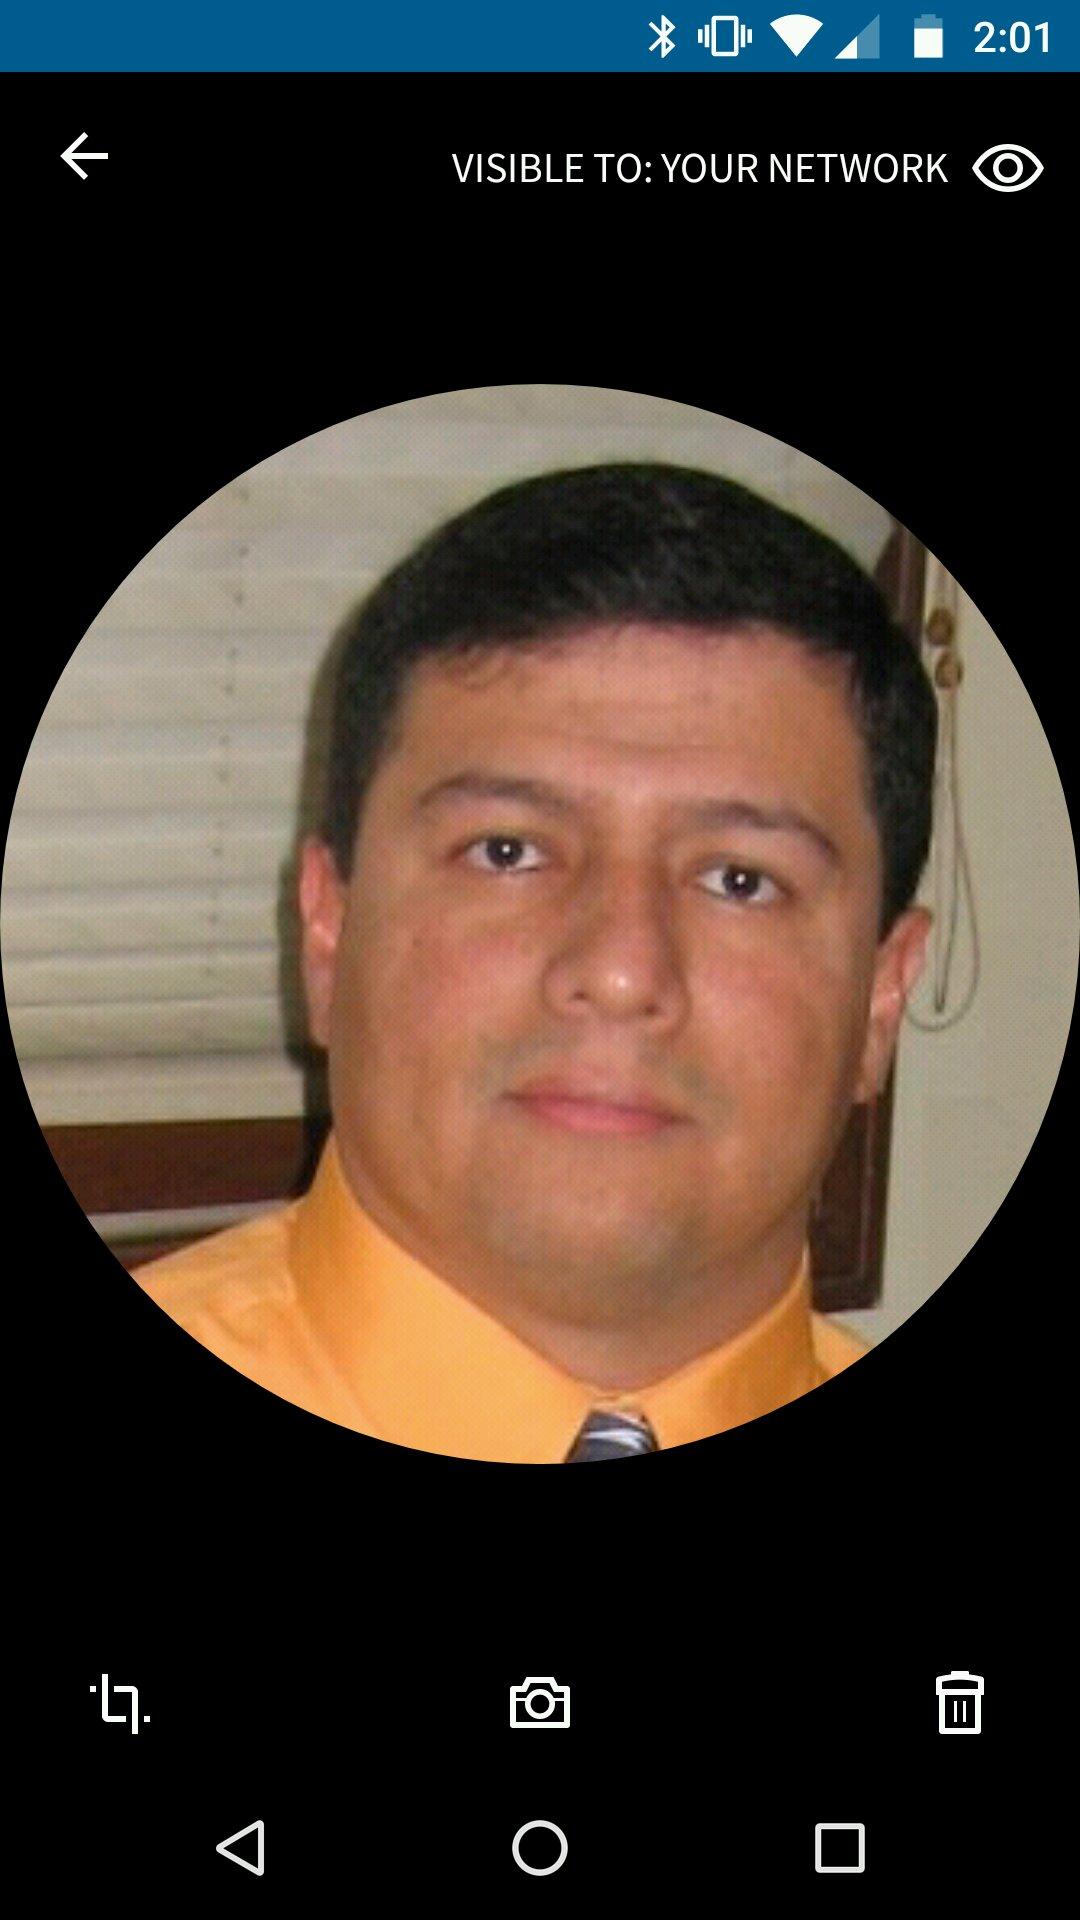 Avatar - Jose Ordonez